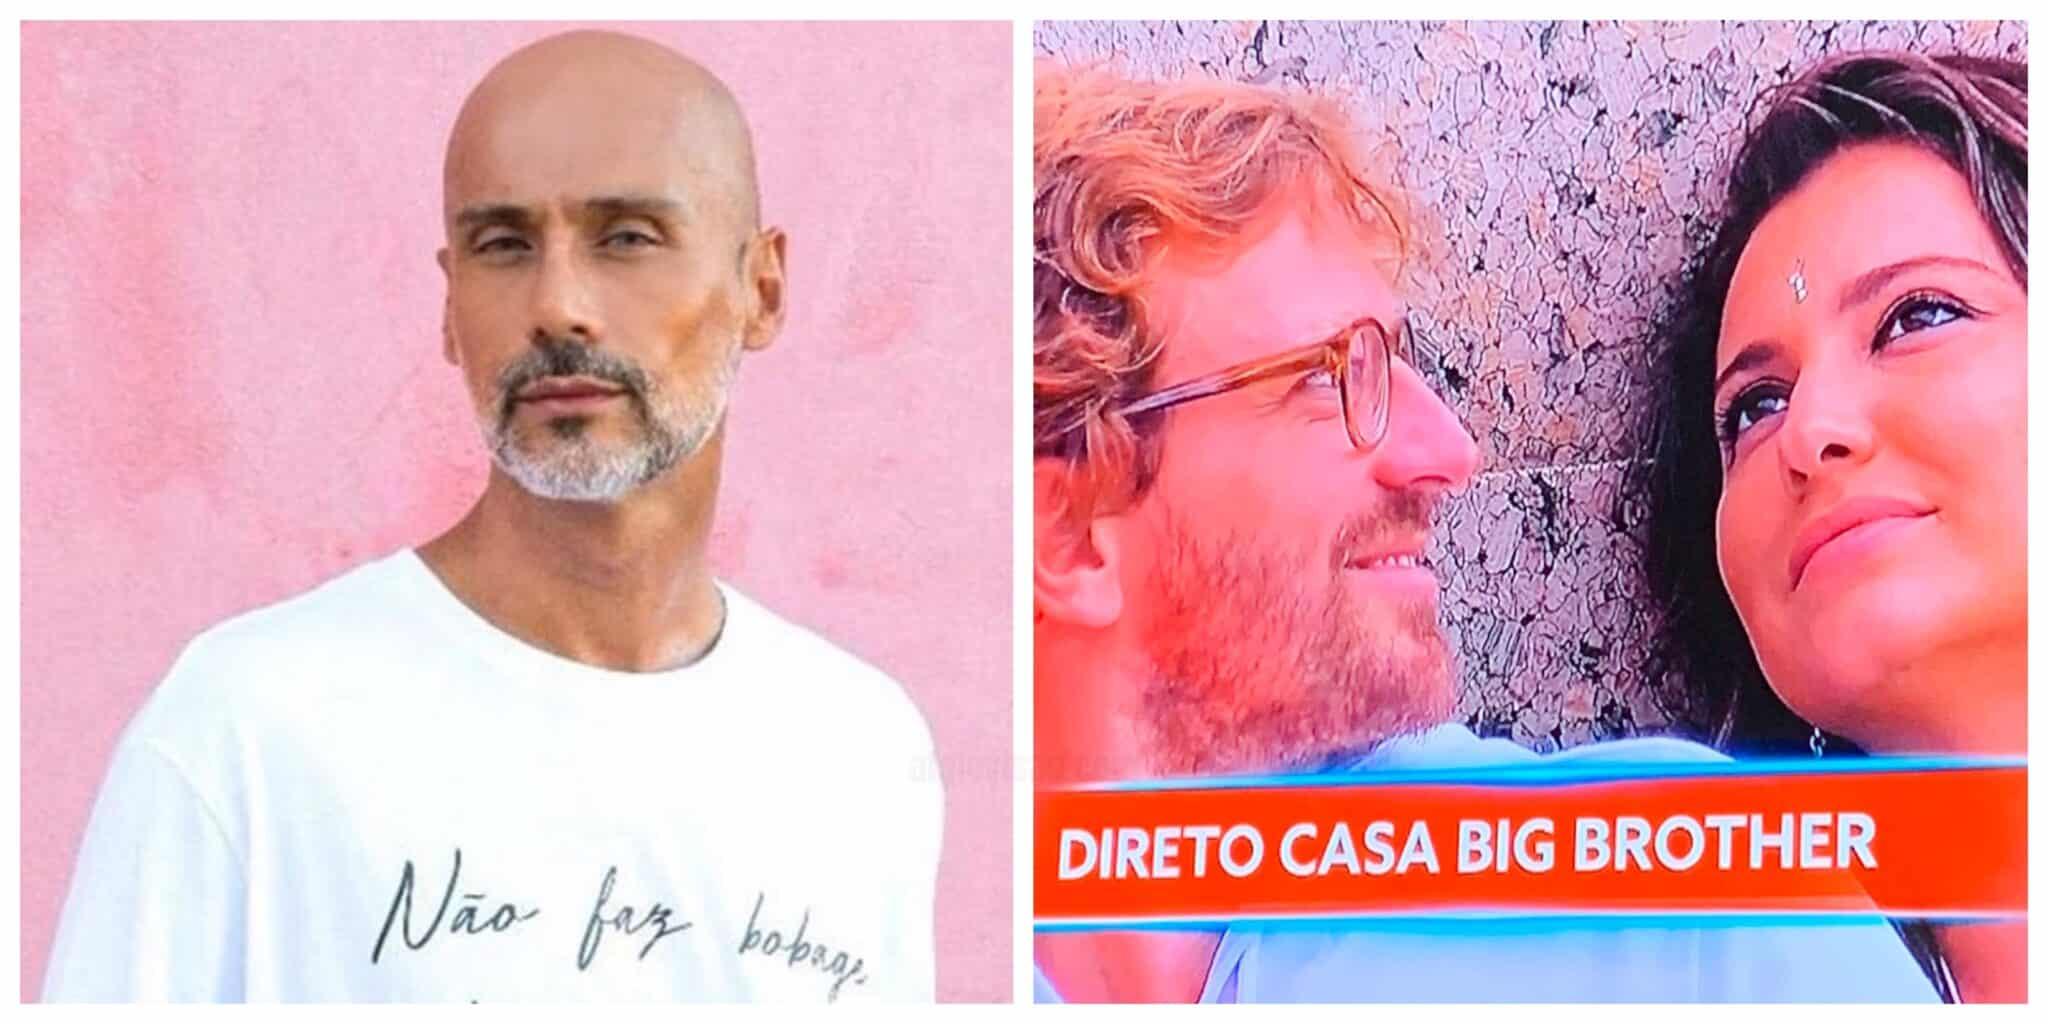 Pedro-Crispim-Ana-Catharina-Diogo